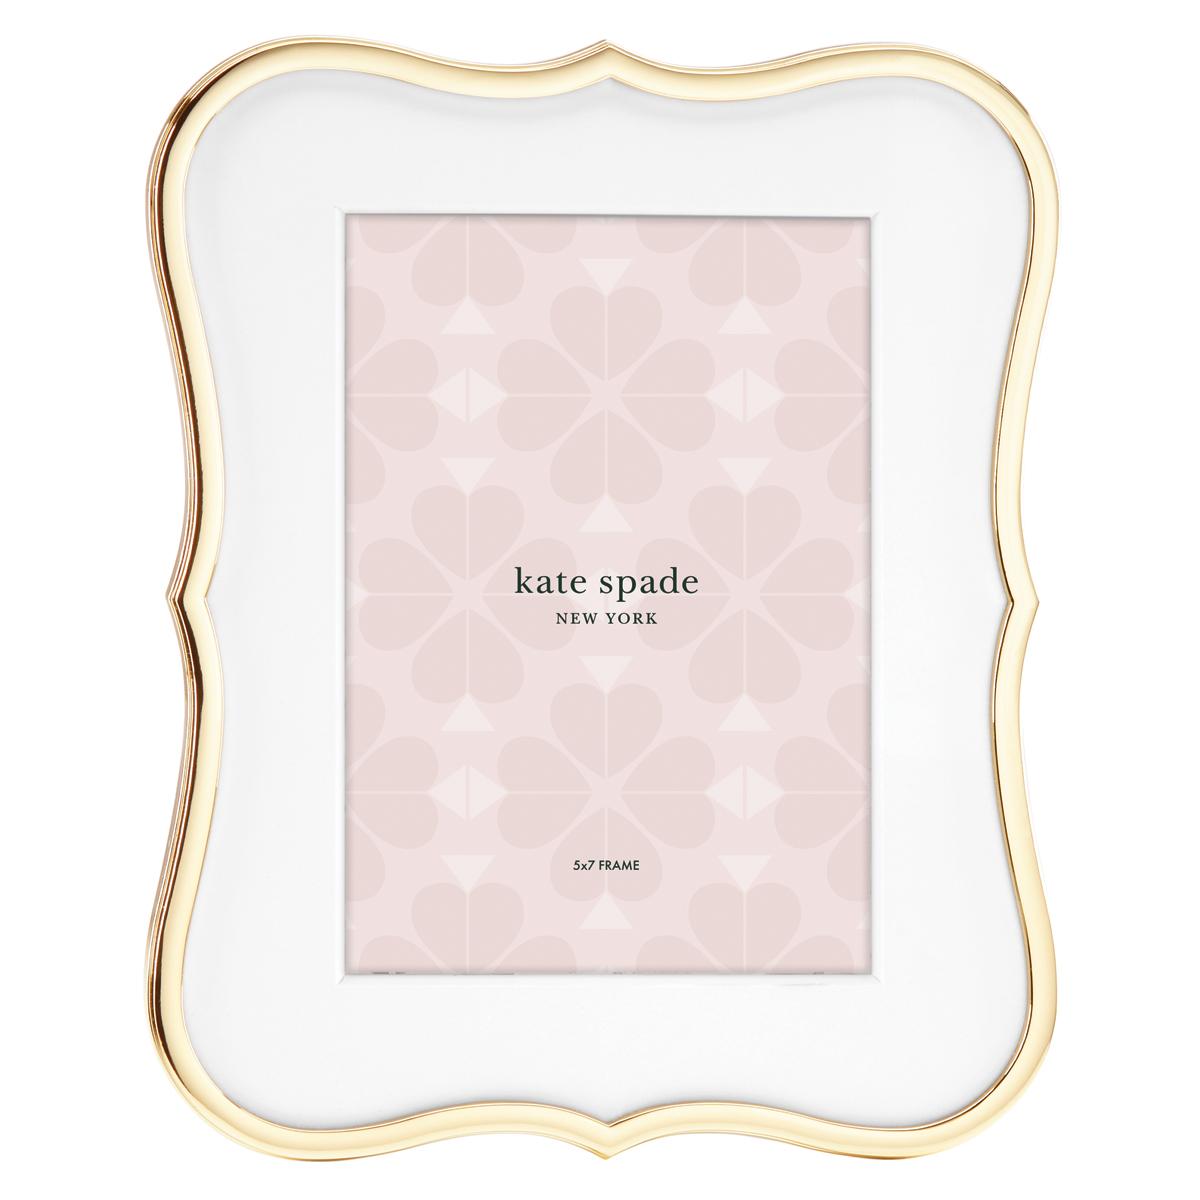 "Kate Spade New York, Lenox Crown Pt Gold Frame 5x7"""